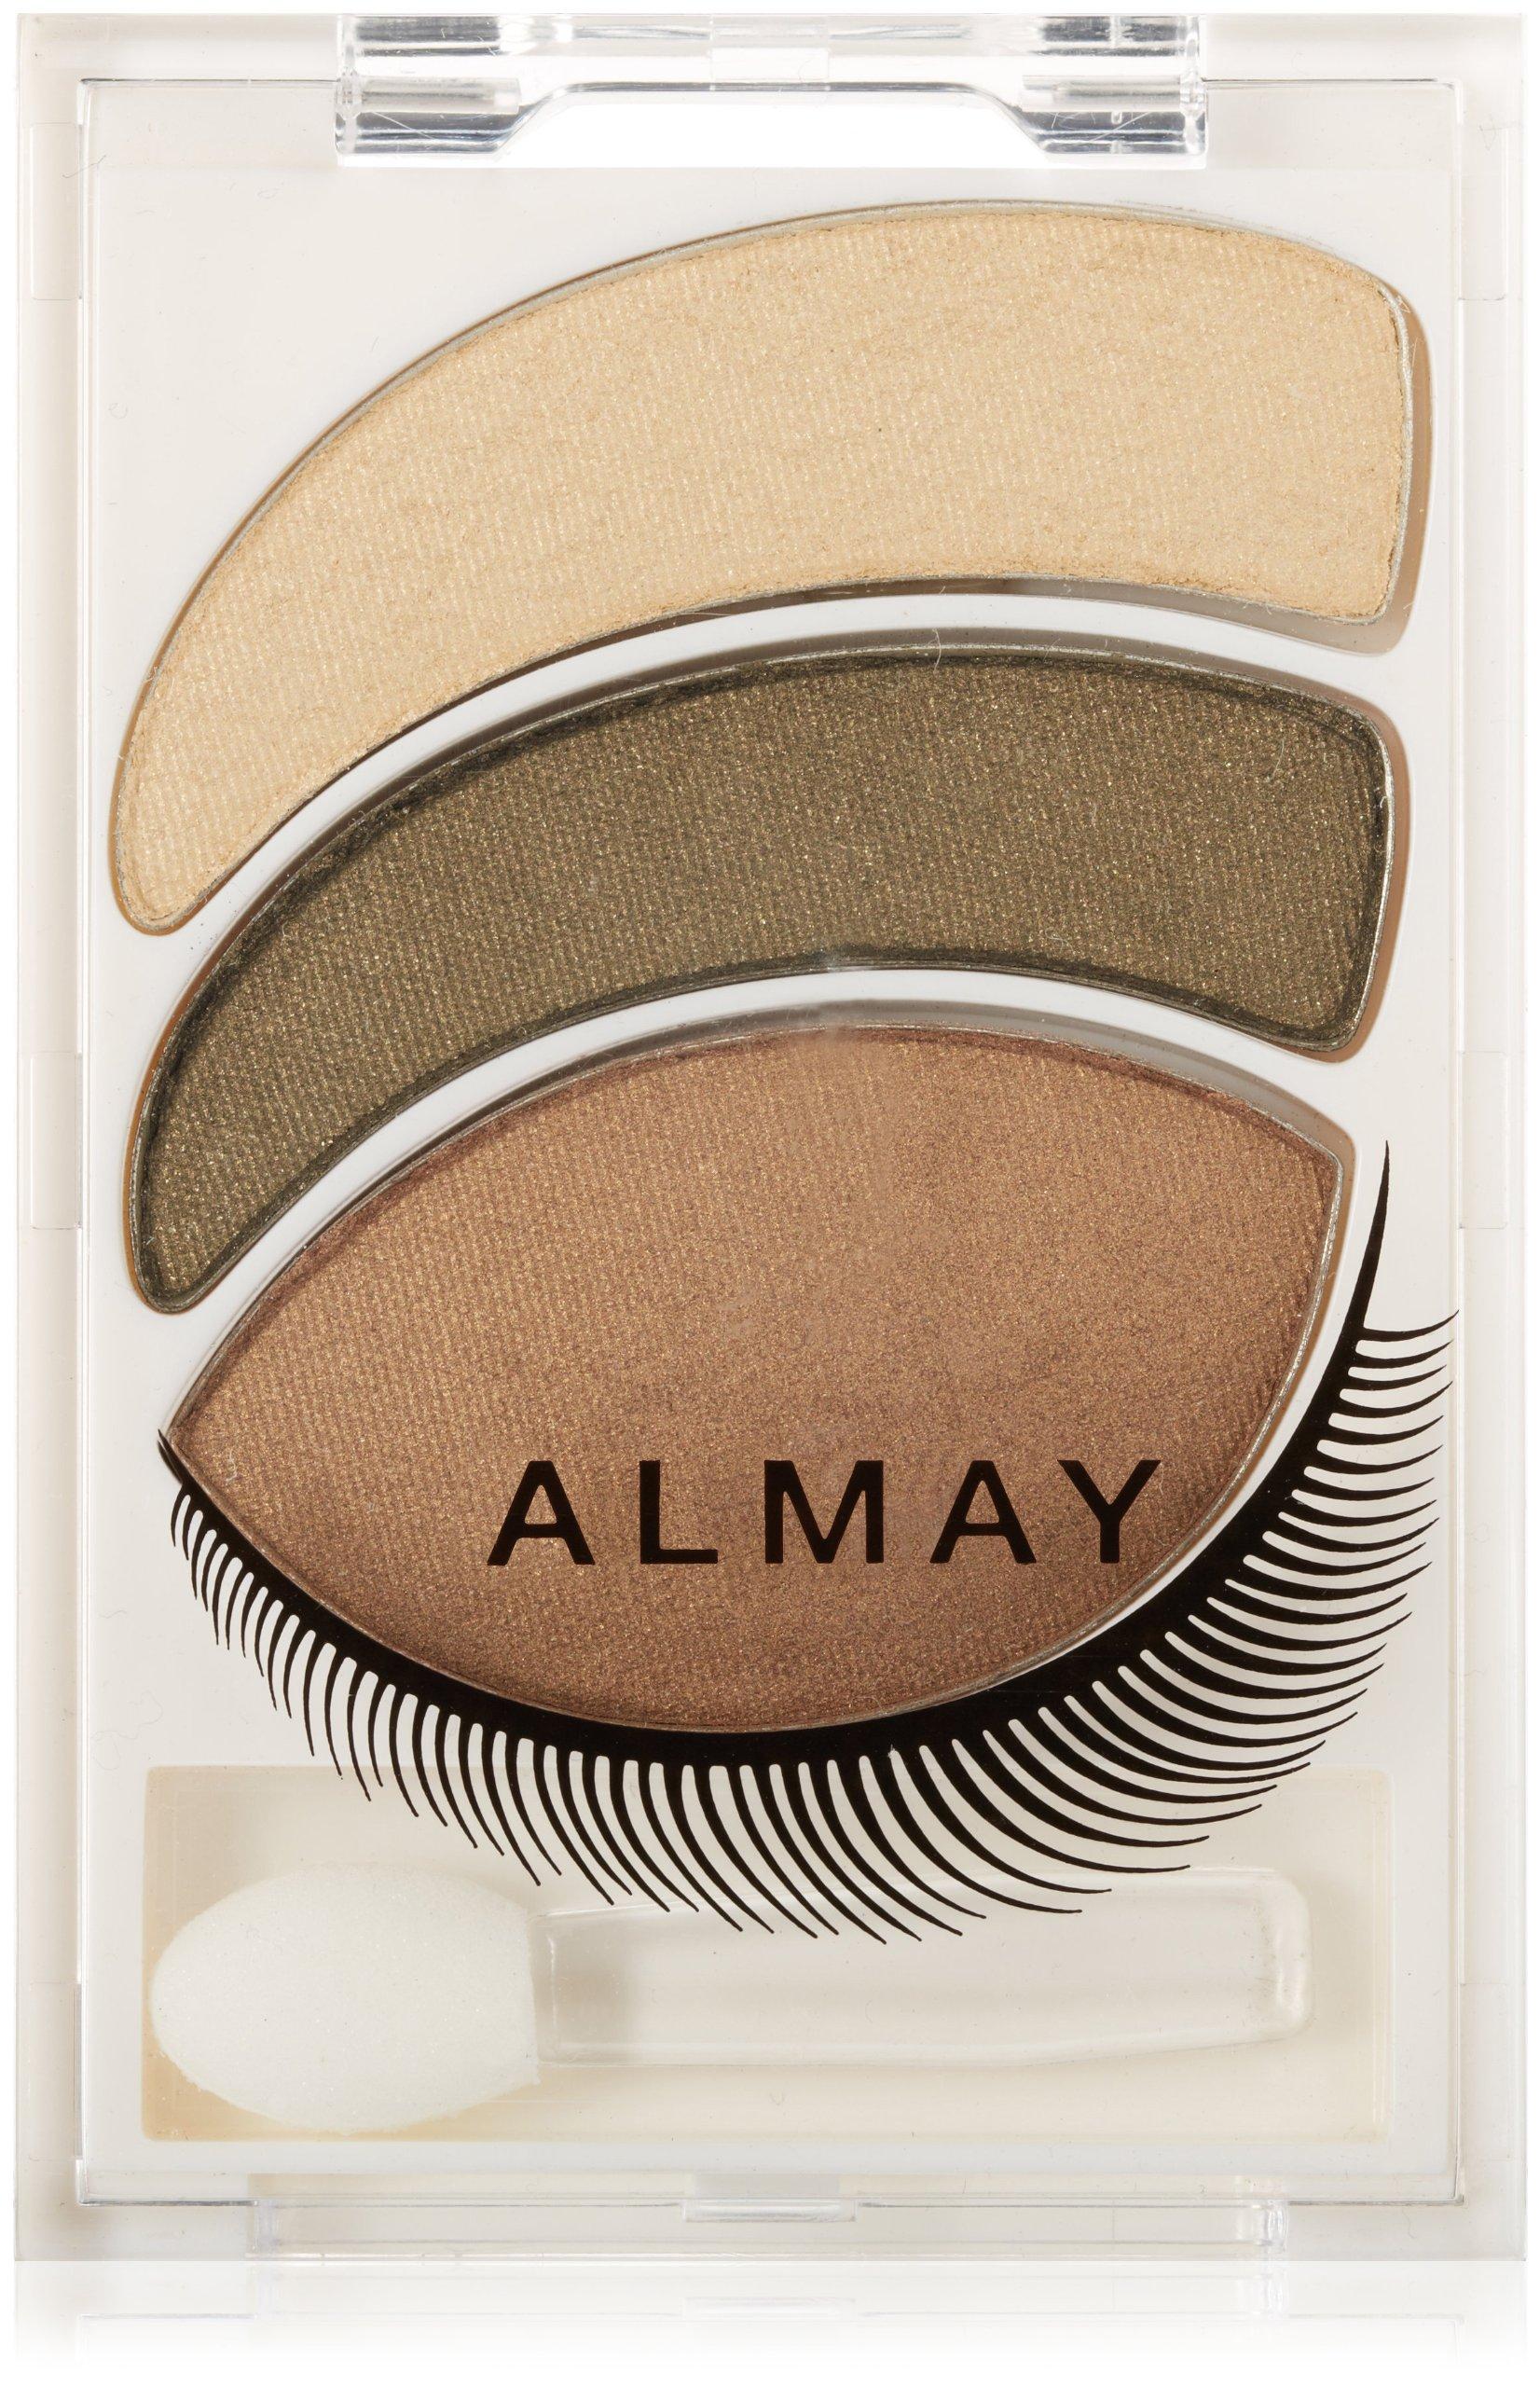 ALMAY Intense I-Color Shimmer-I Kit, Green